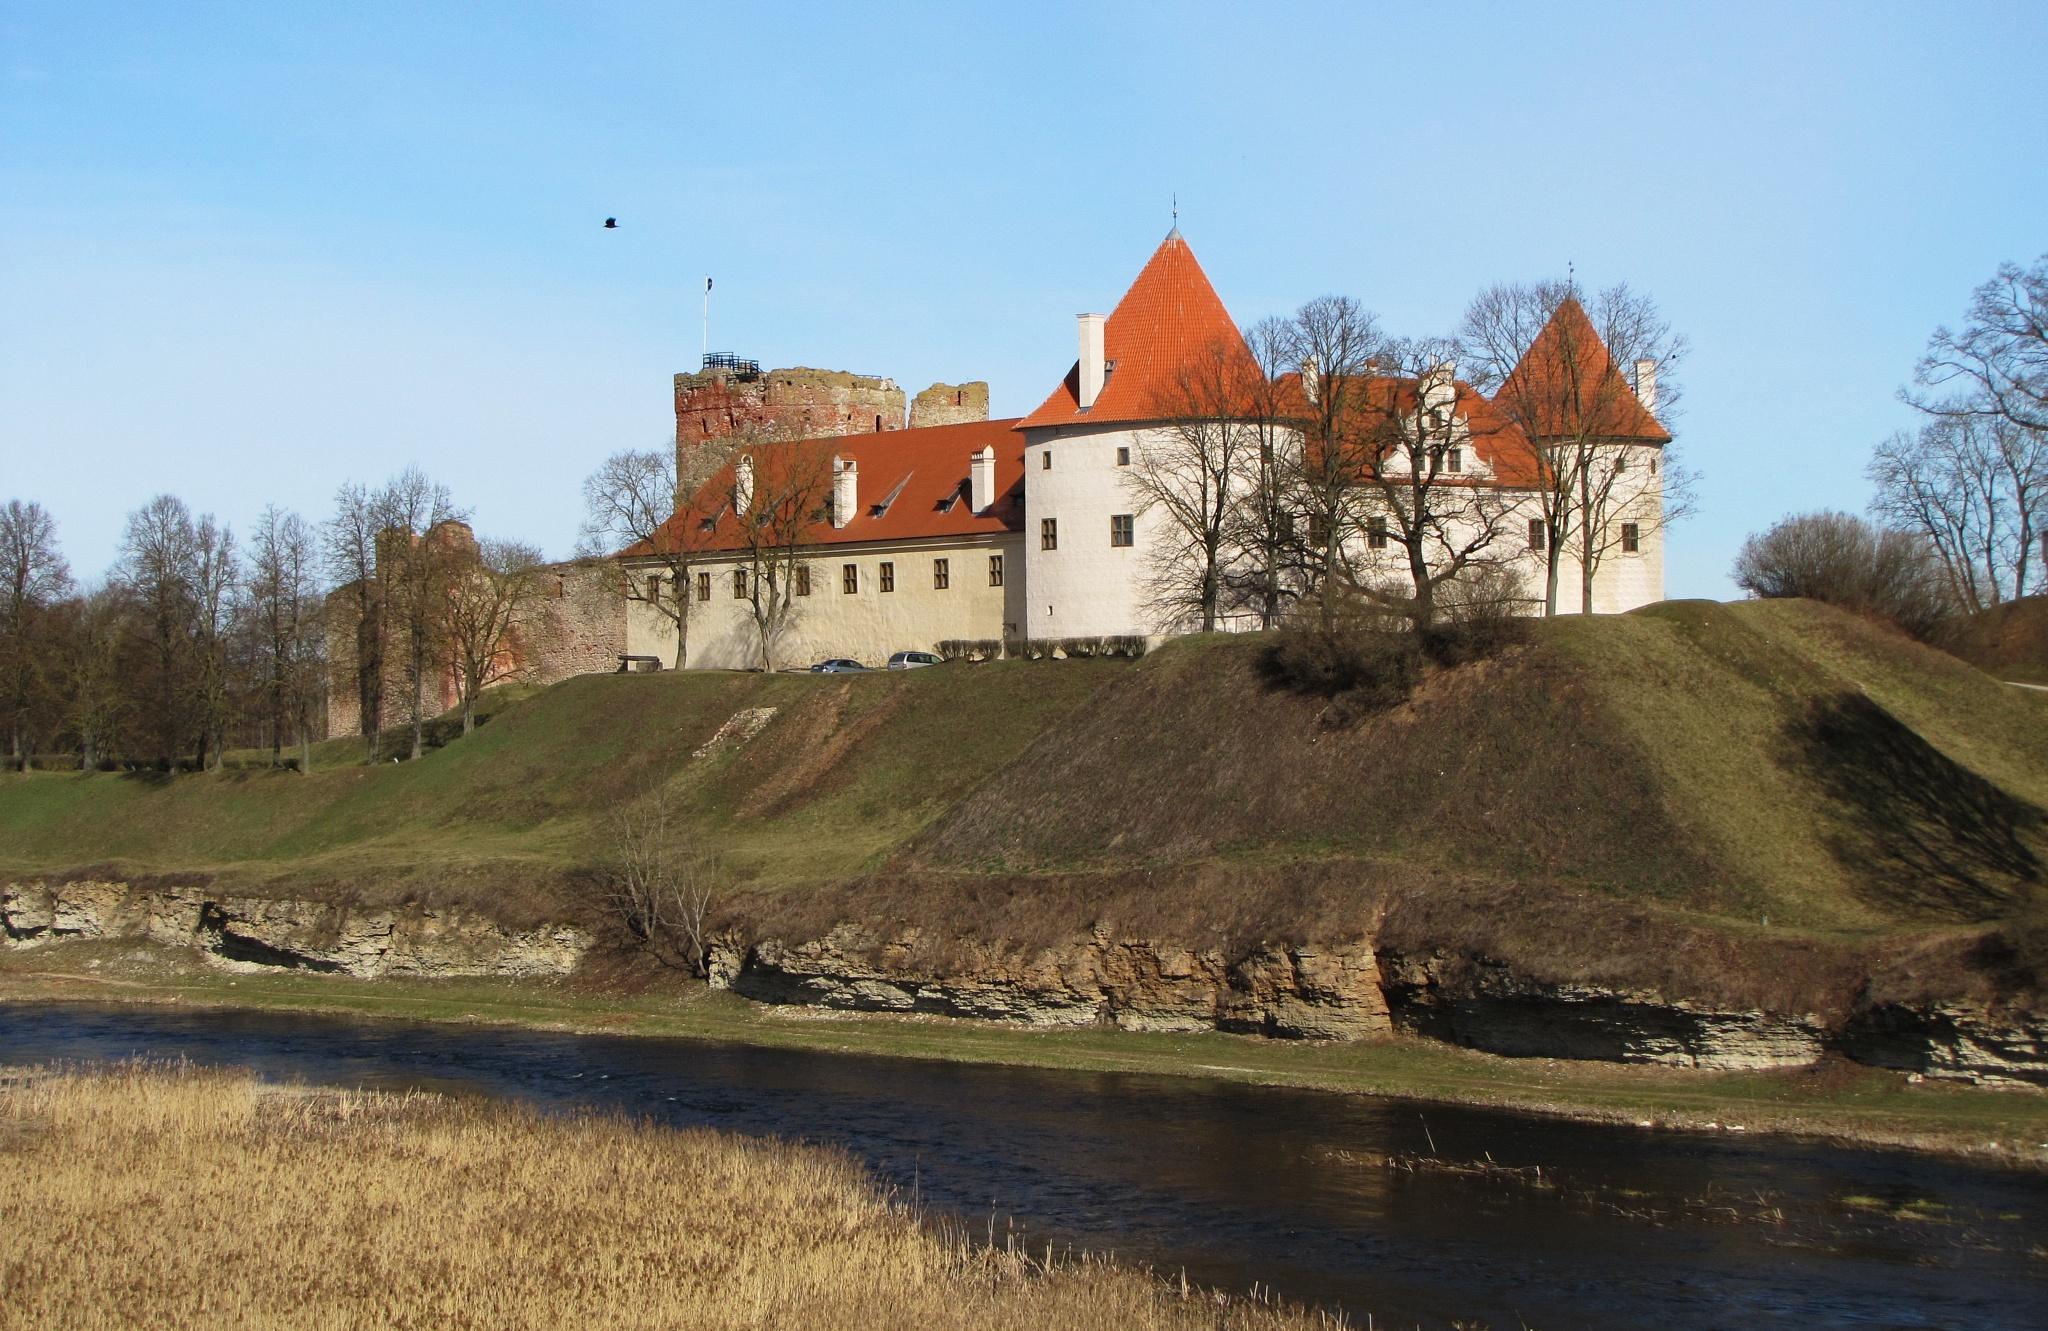 Bauska castle by Ilga Freimane